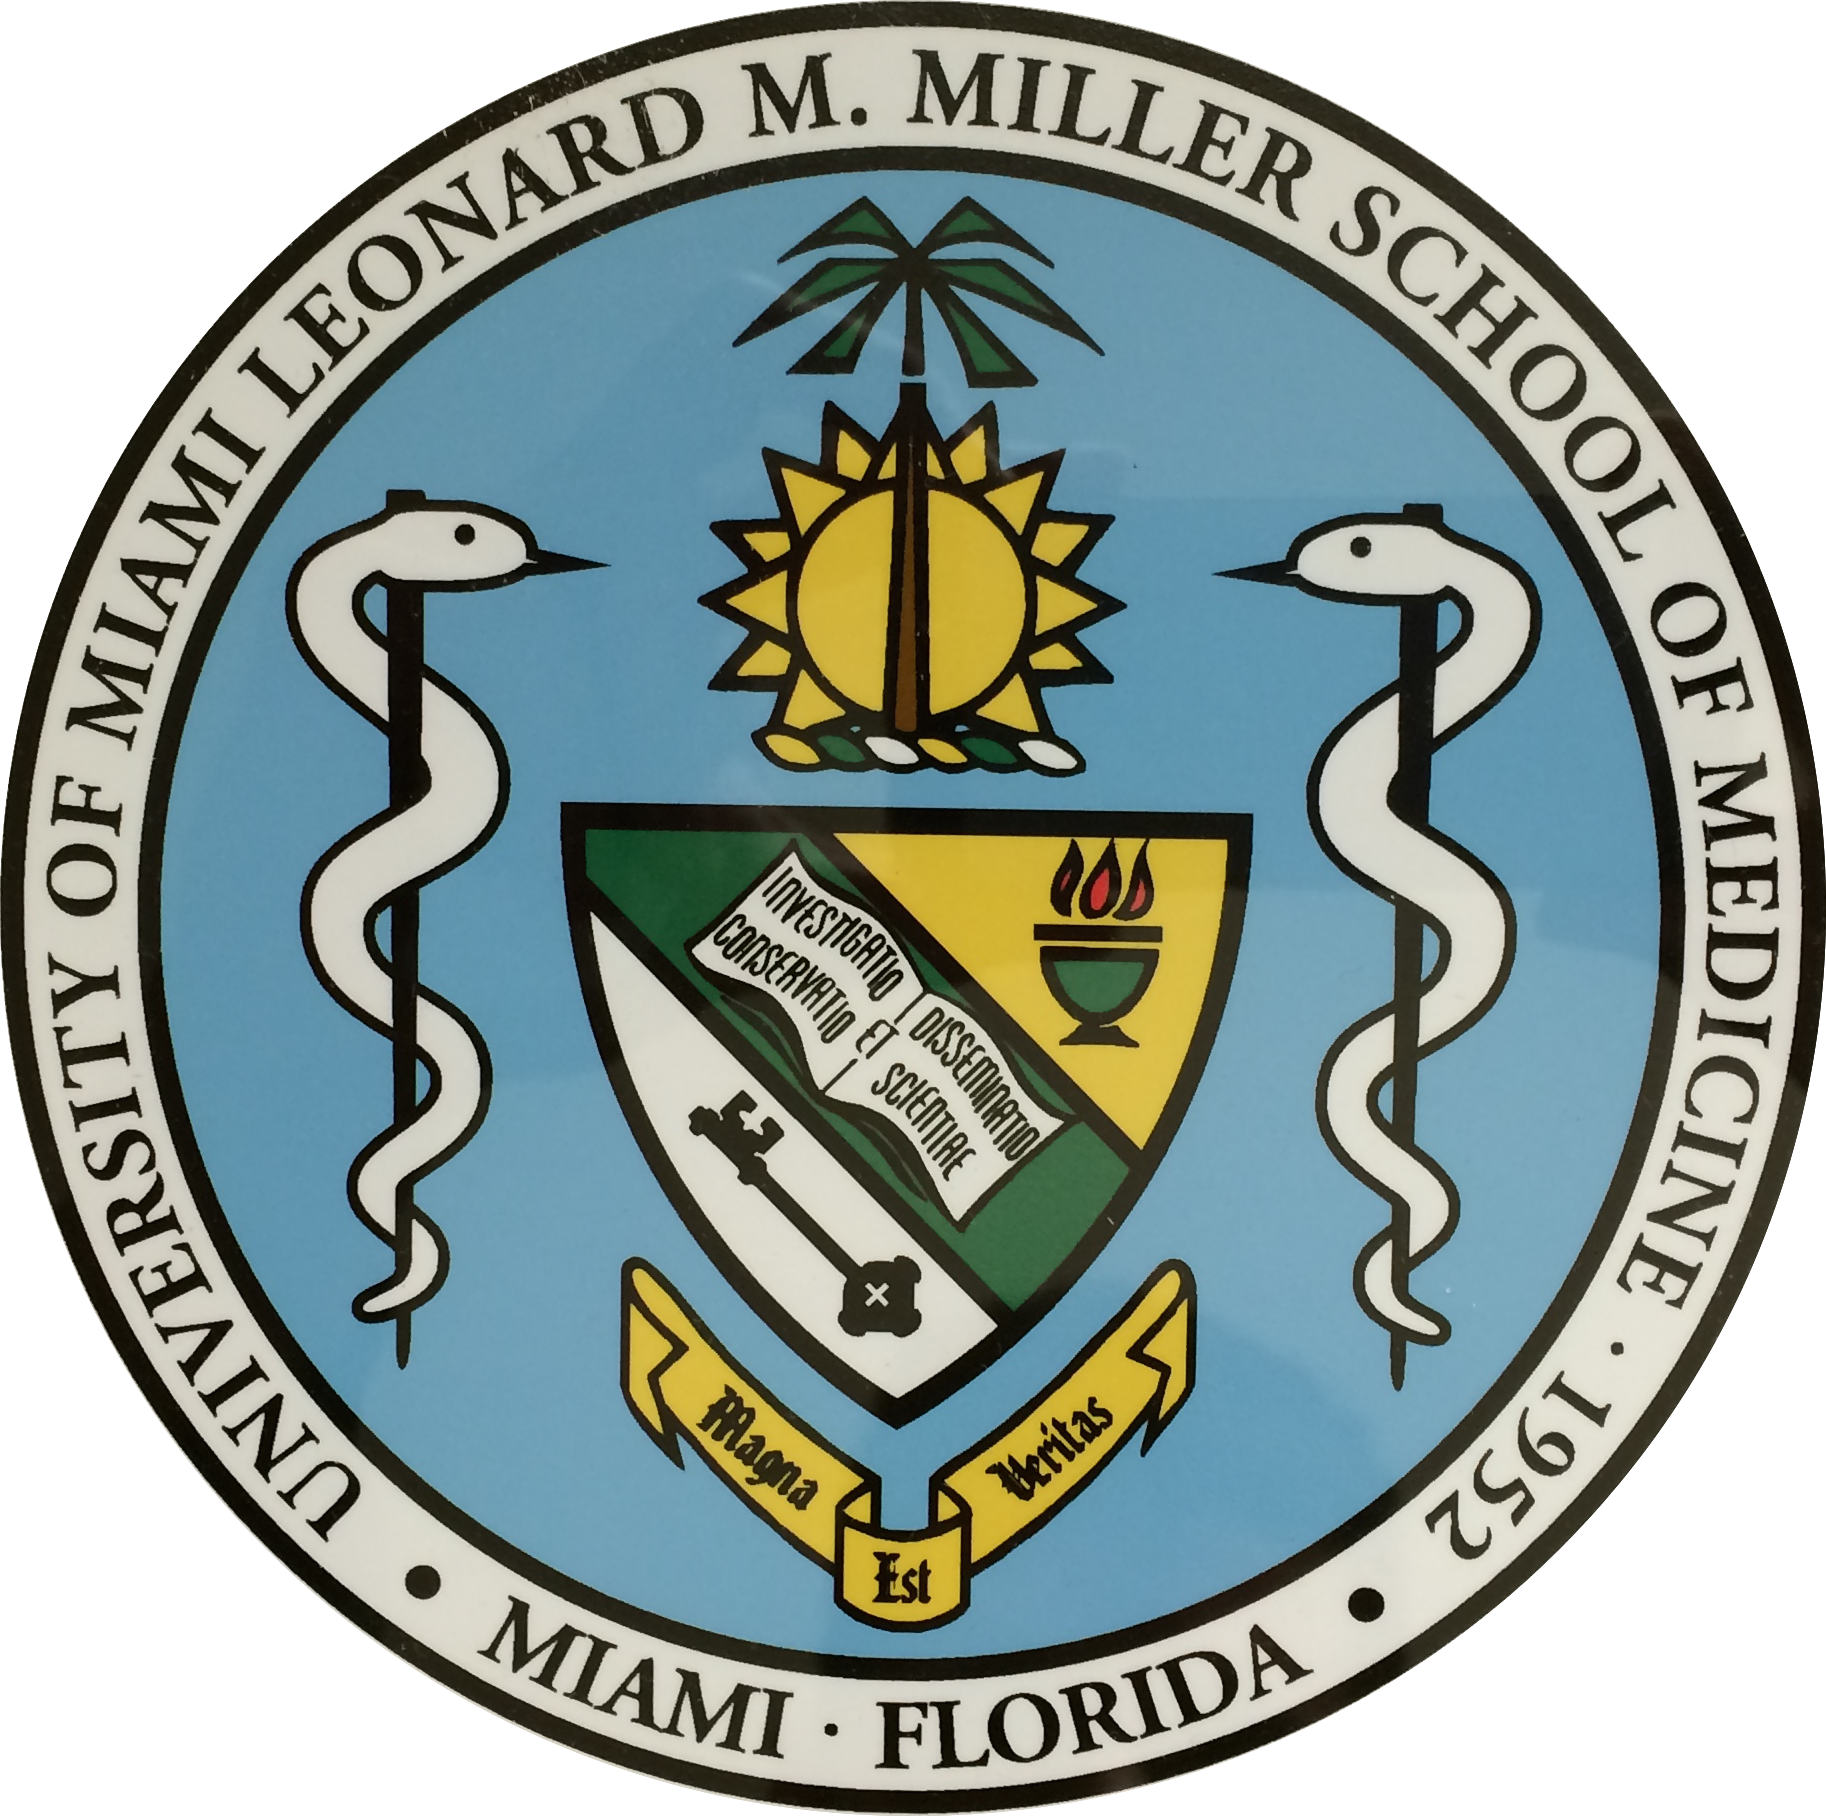 Miami Jackson Hospital Emergency Room